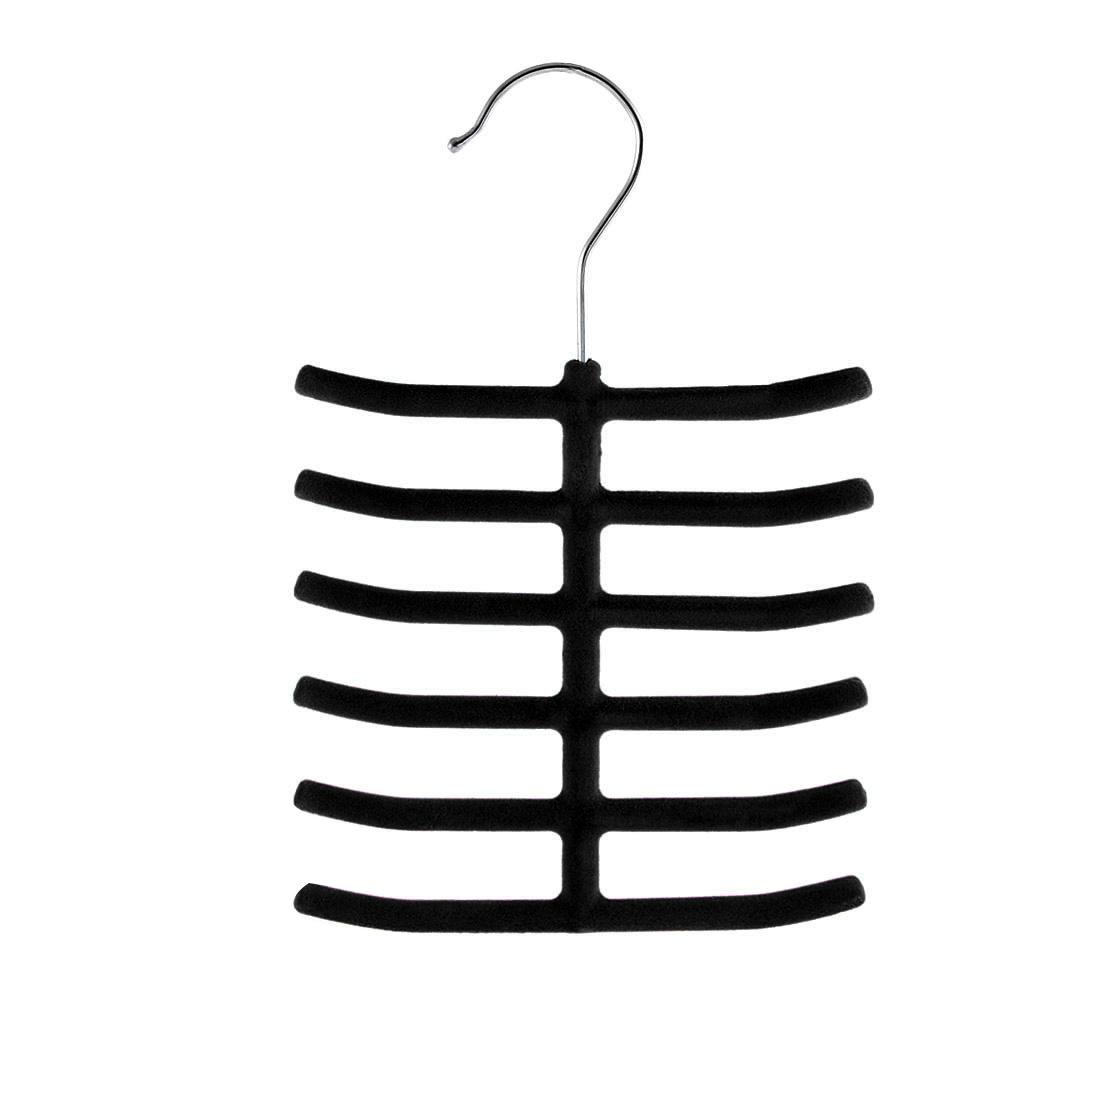 Household Bedroom Fishbone Shaped Towel Belt Shawl Scarf Necktie Rack Holder Black